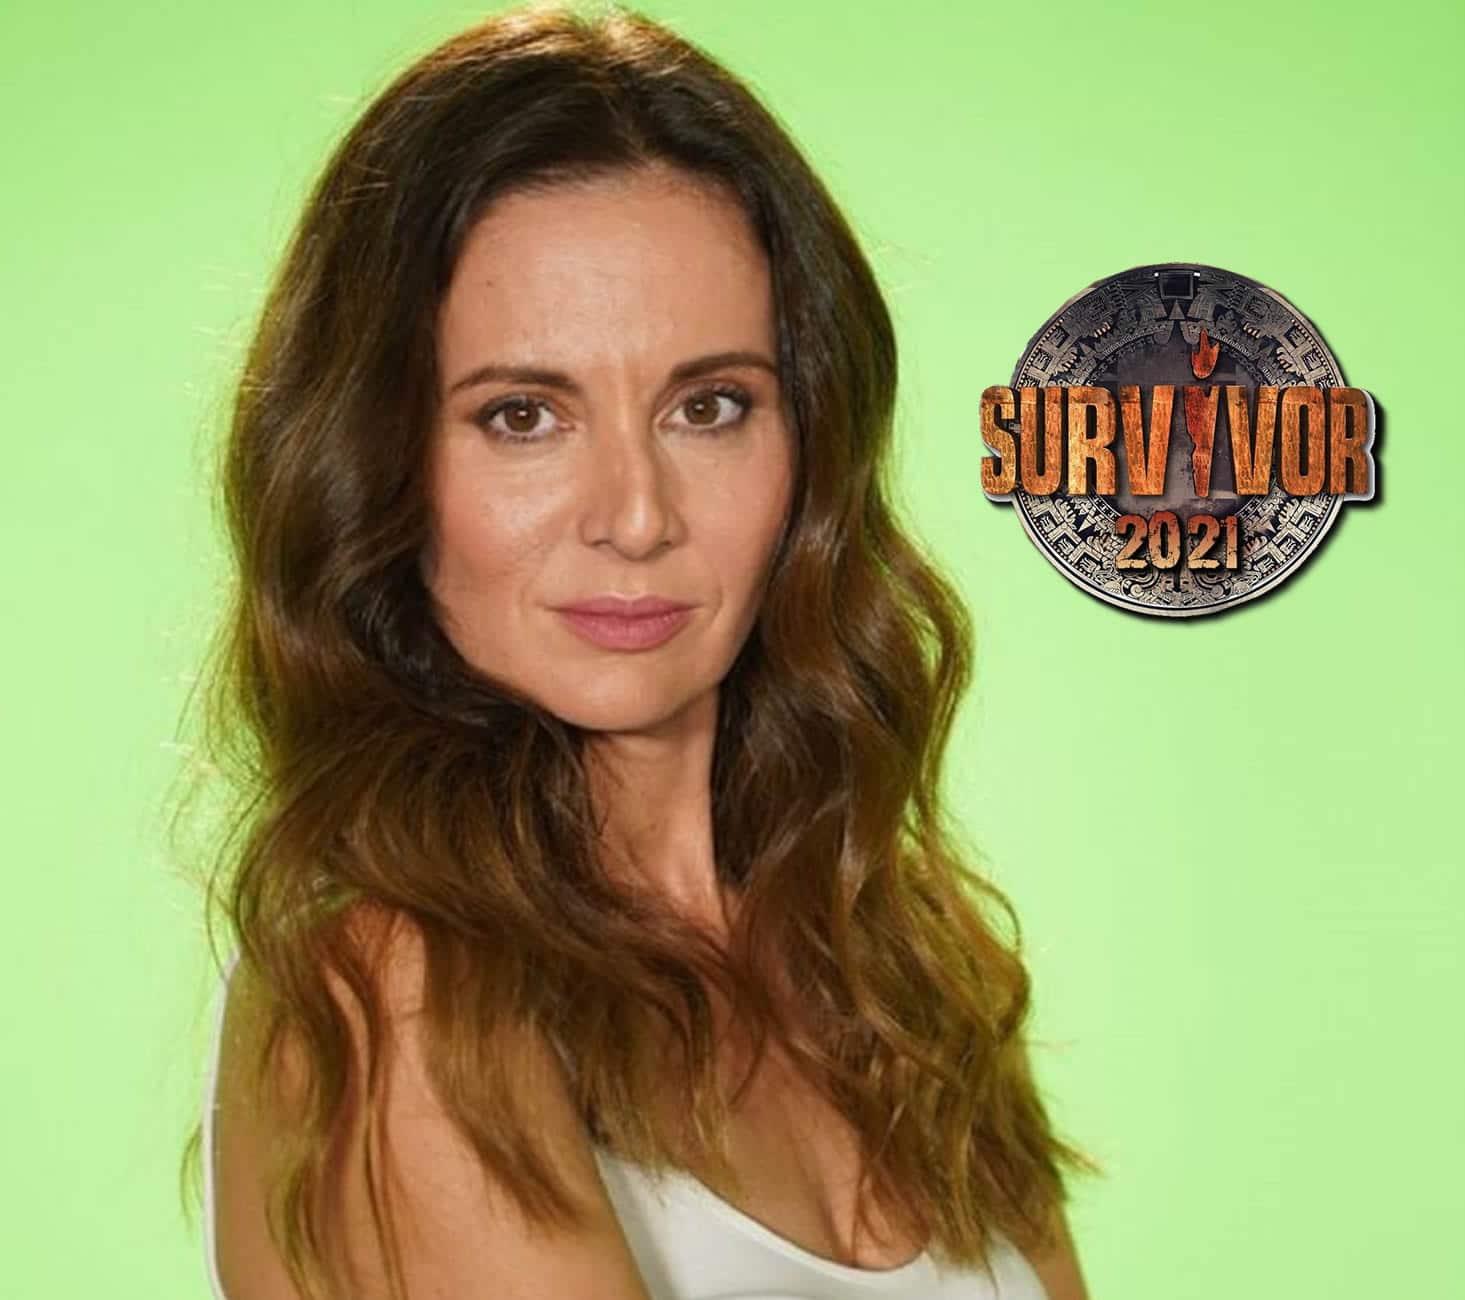 Survivor 2021, Αγγελική Λάμπρη